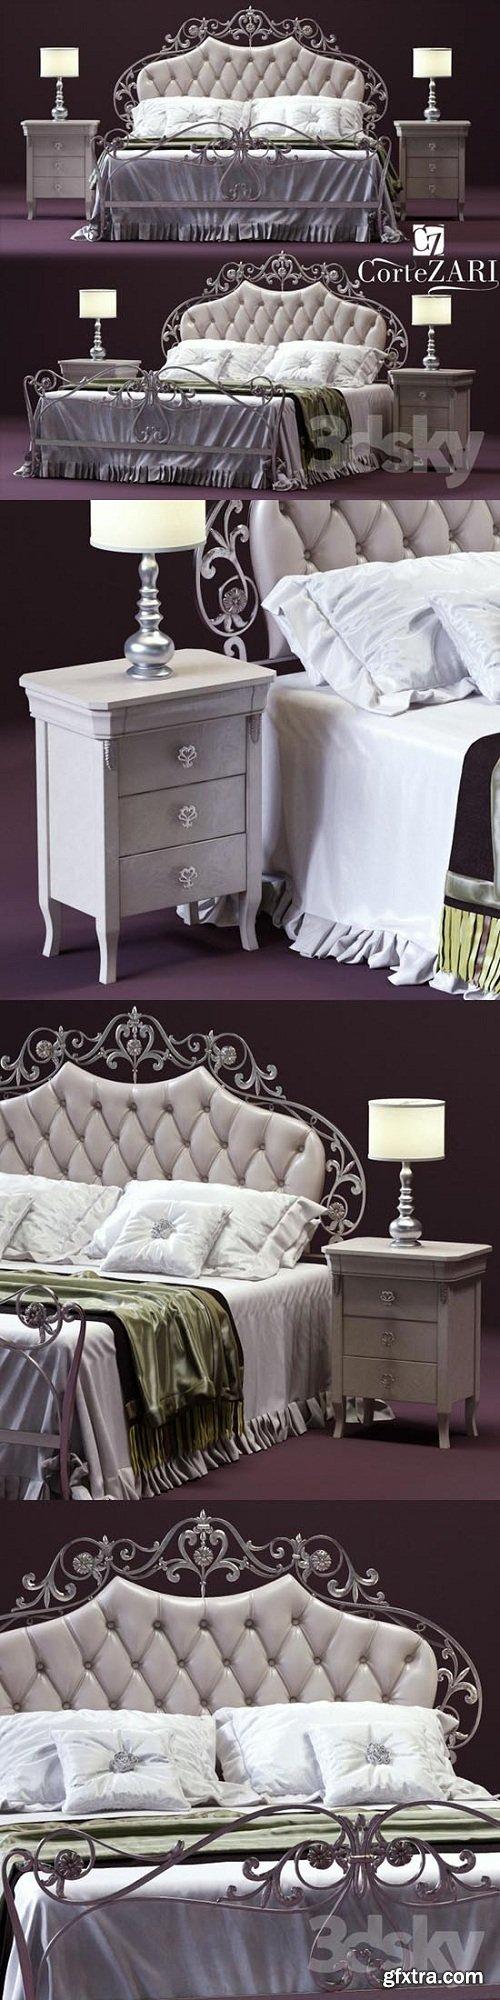 CorteZARI OLIMPIA Double Bed 3d Model